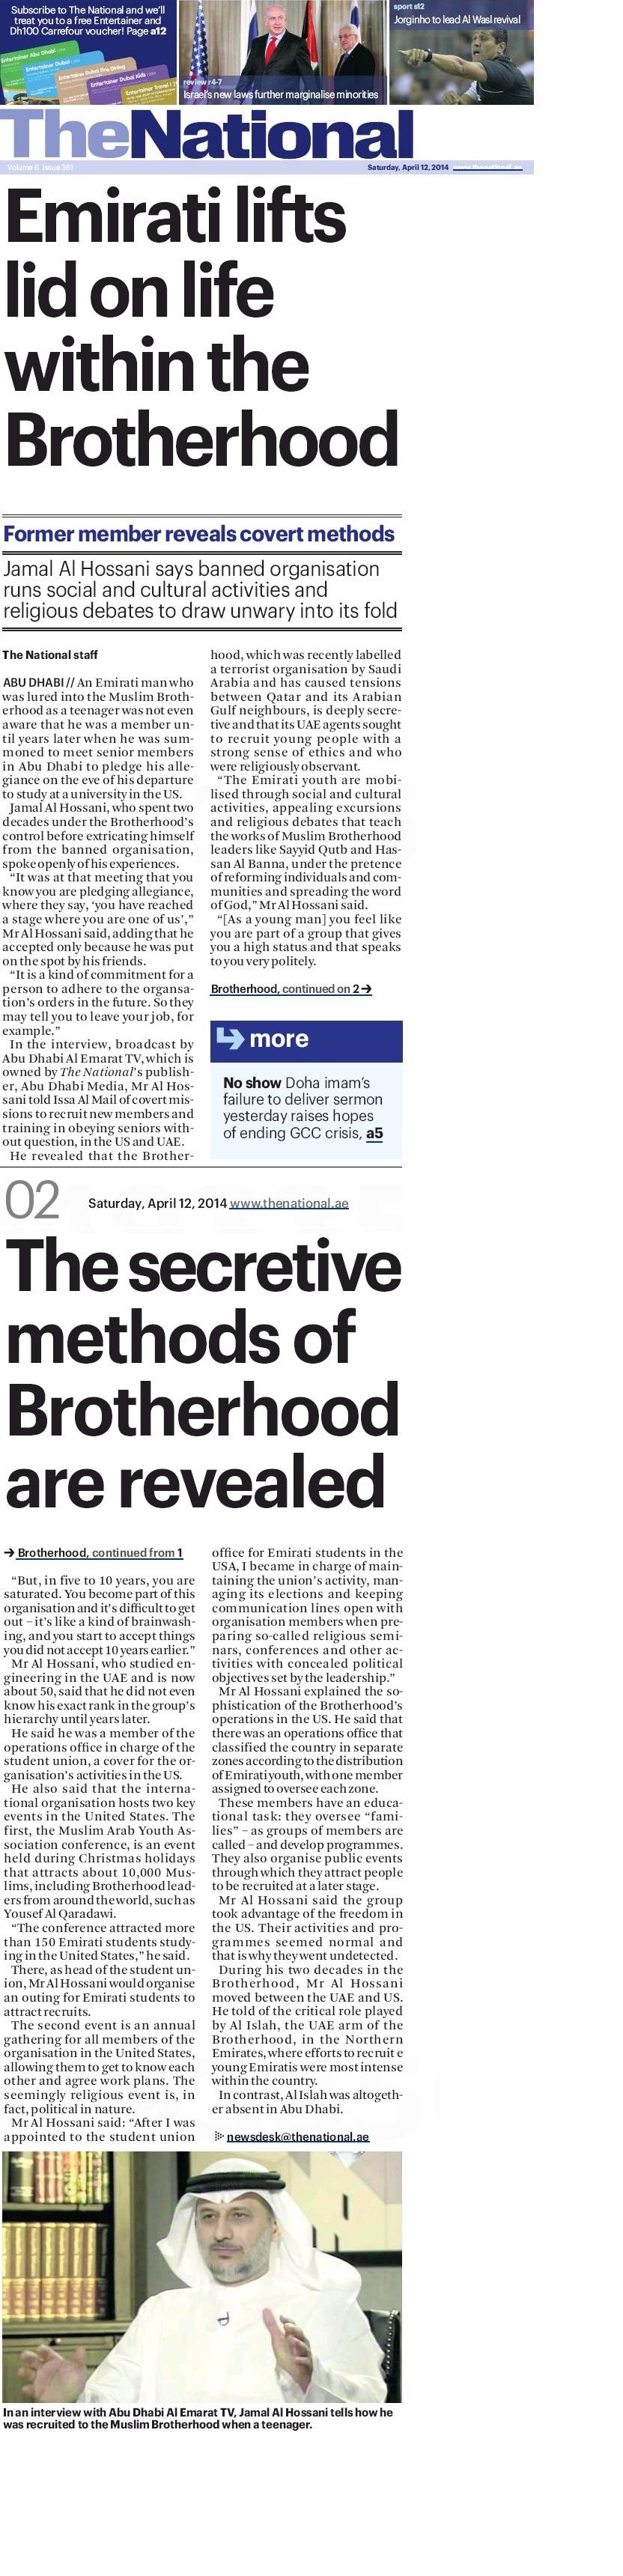 MB Recruited Secretive